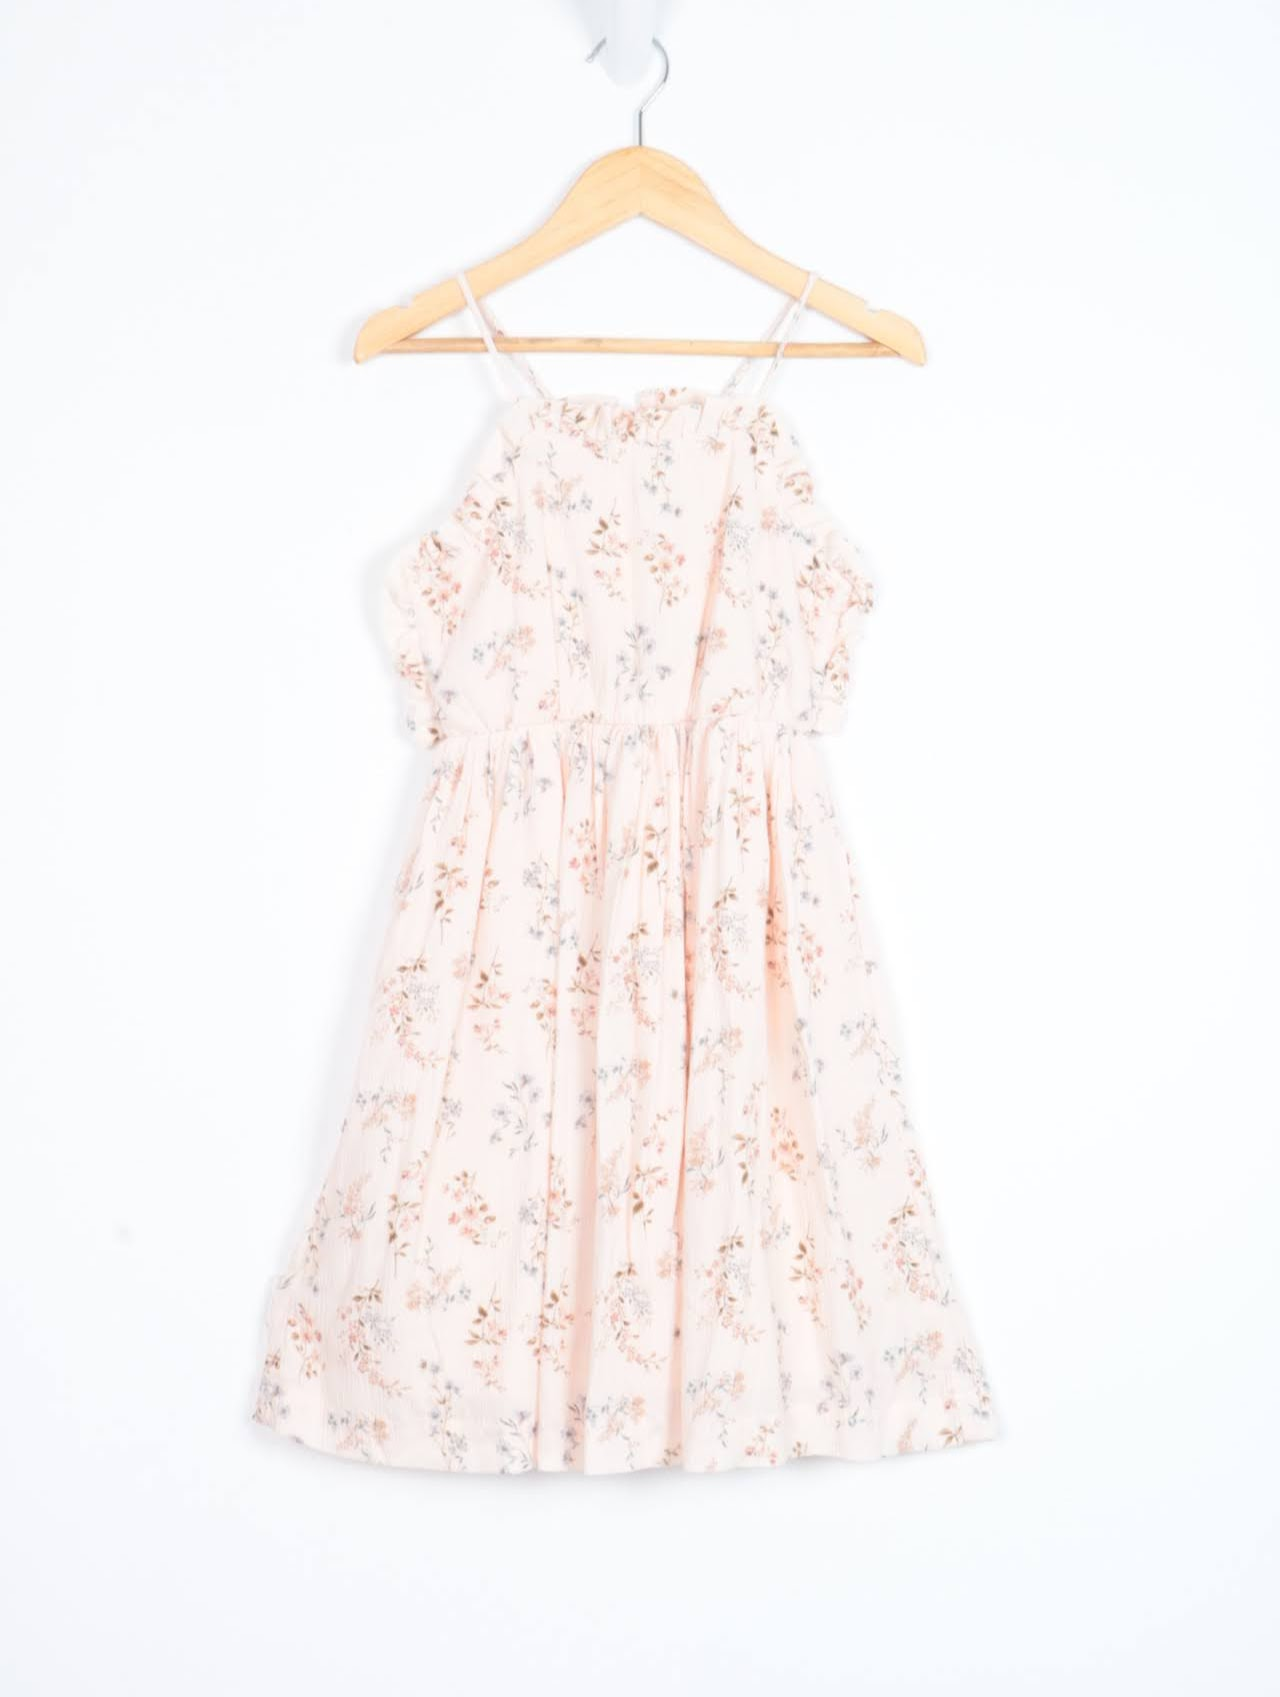 Vestido Curto - Mng - 07 Anos